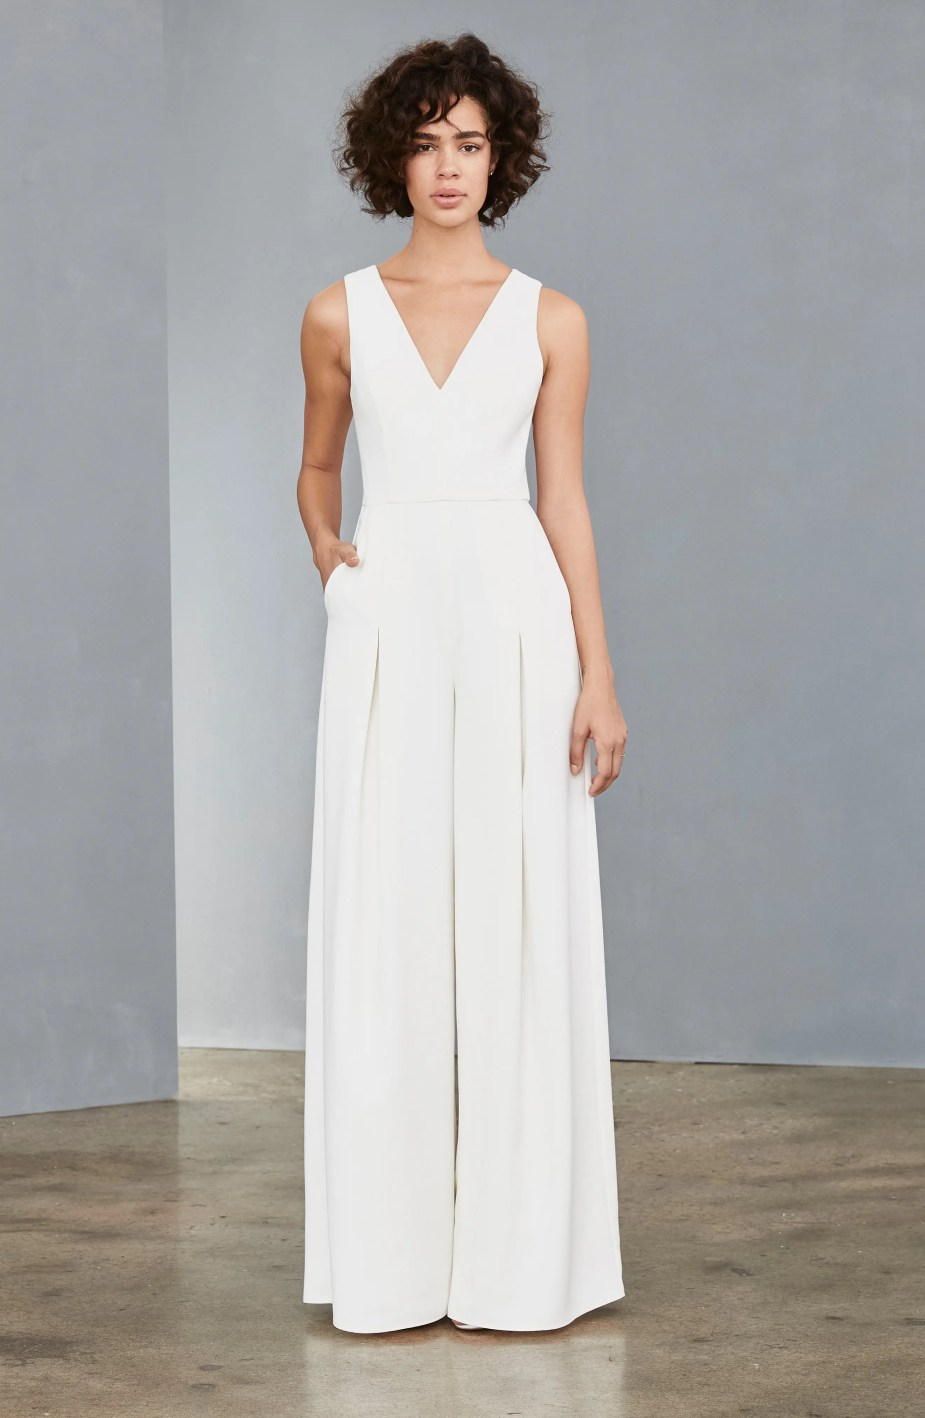 Nordstrom Wedding Dresses.Nordstrom Wedding Dresses Wedding Dresses For Budget Brides